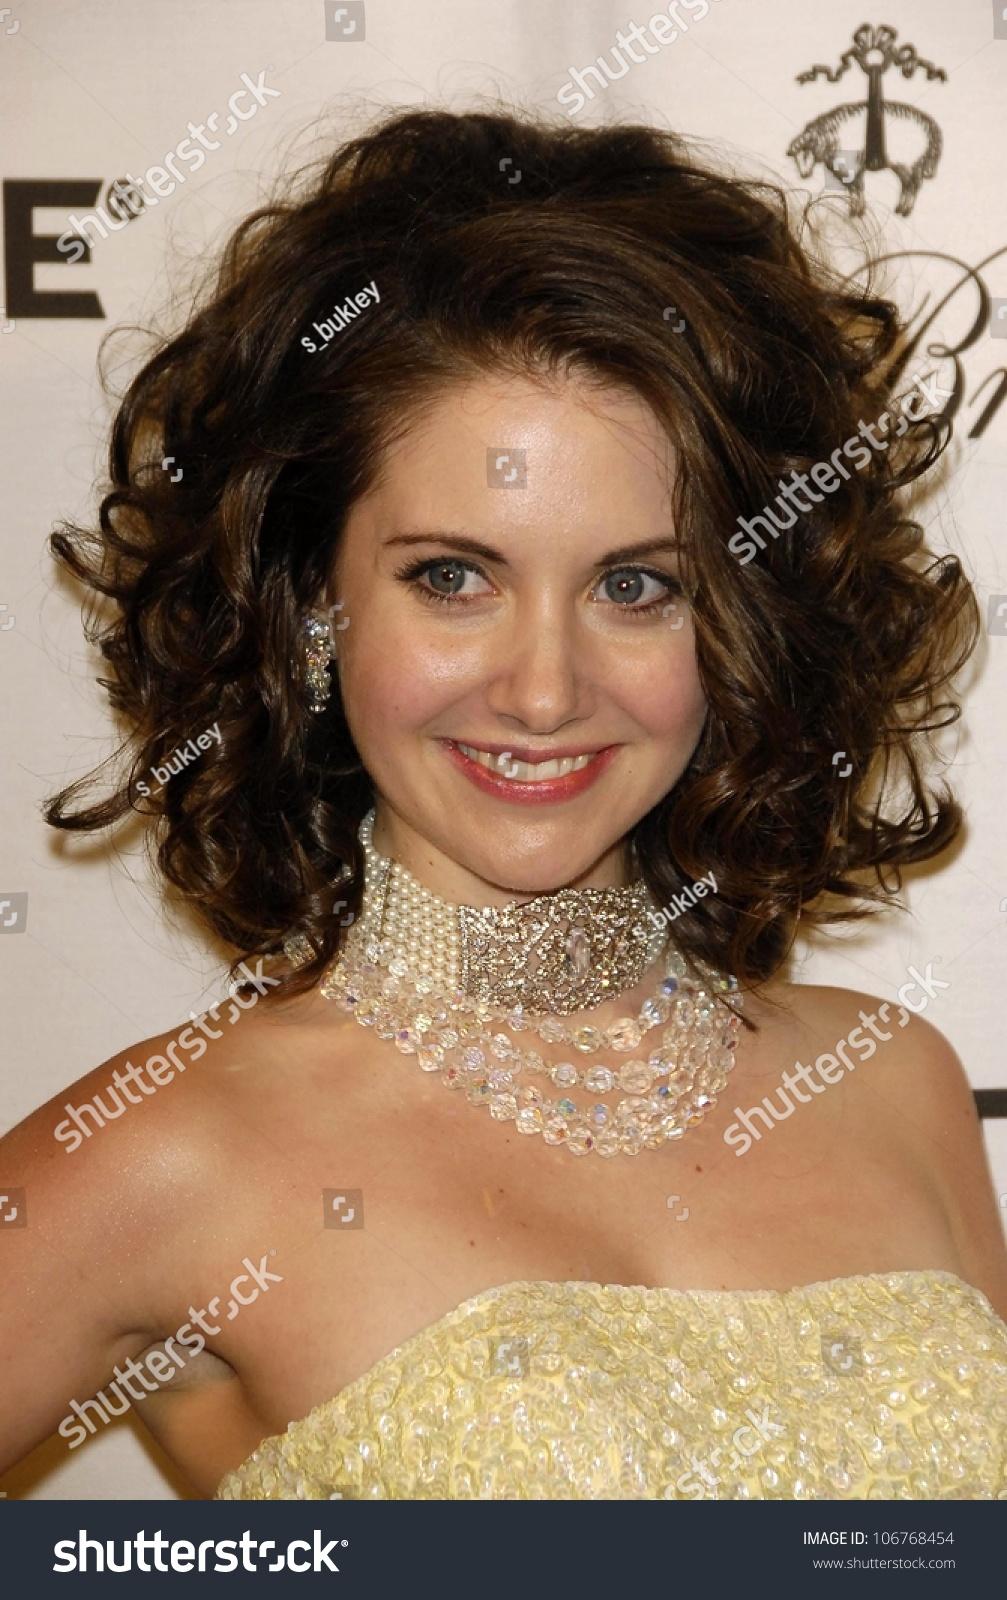 Alison Rey alison brie live revue night on stock photo (edit now) 106768454